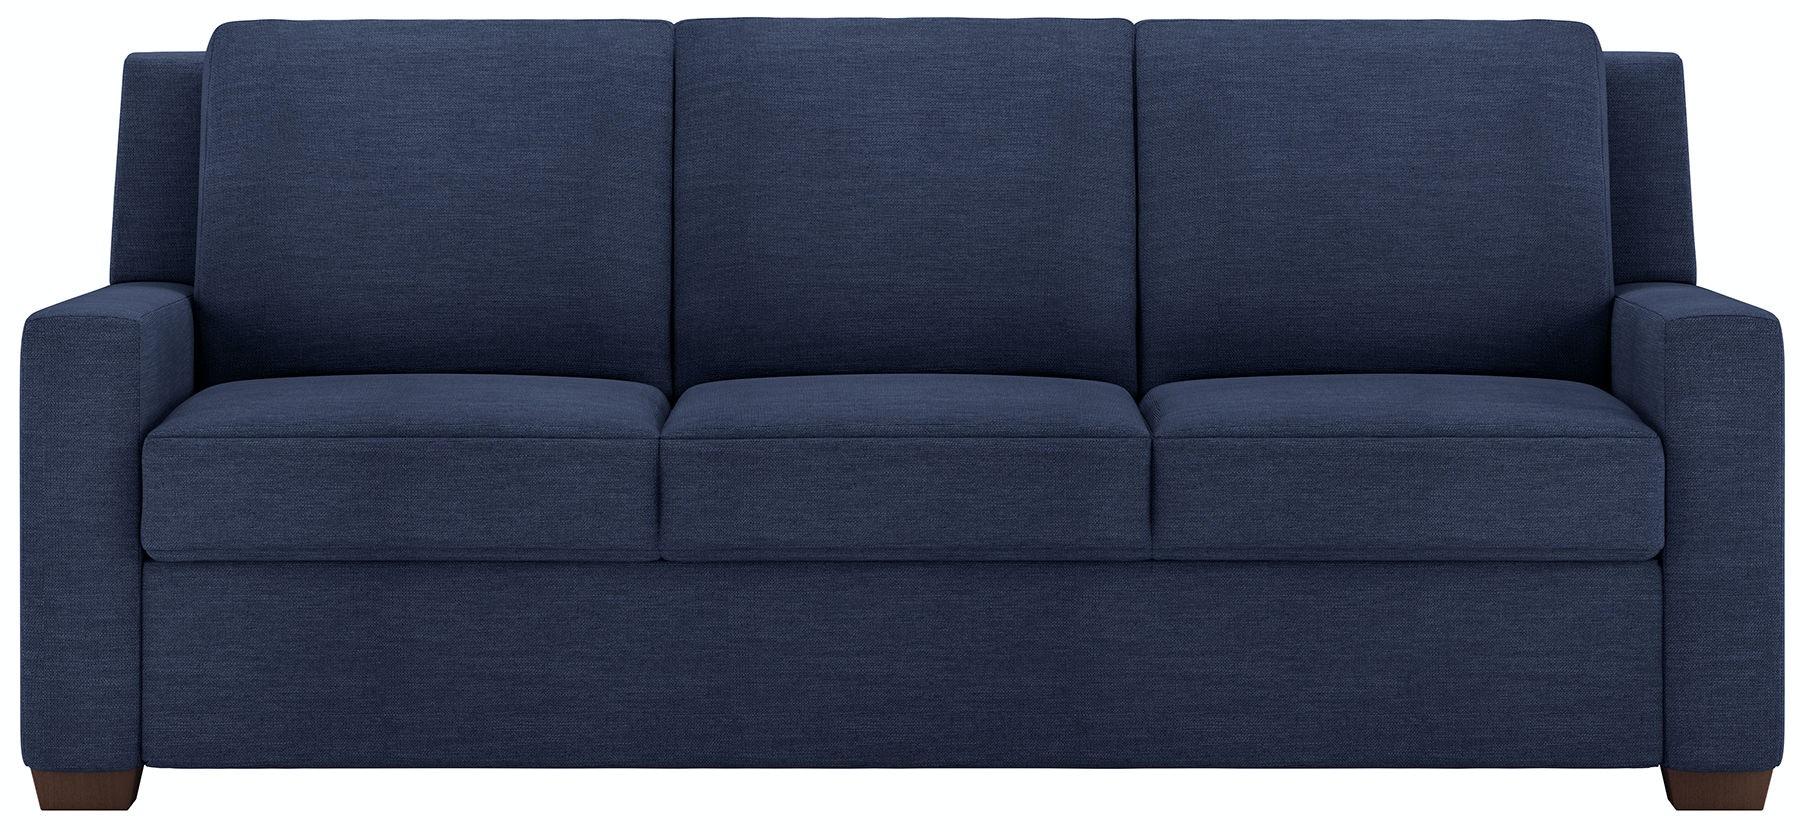 american leather living room sofa sleeper queen plus size lyo so3 rh pennymustard com